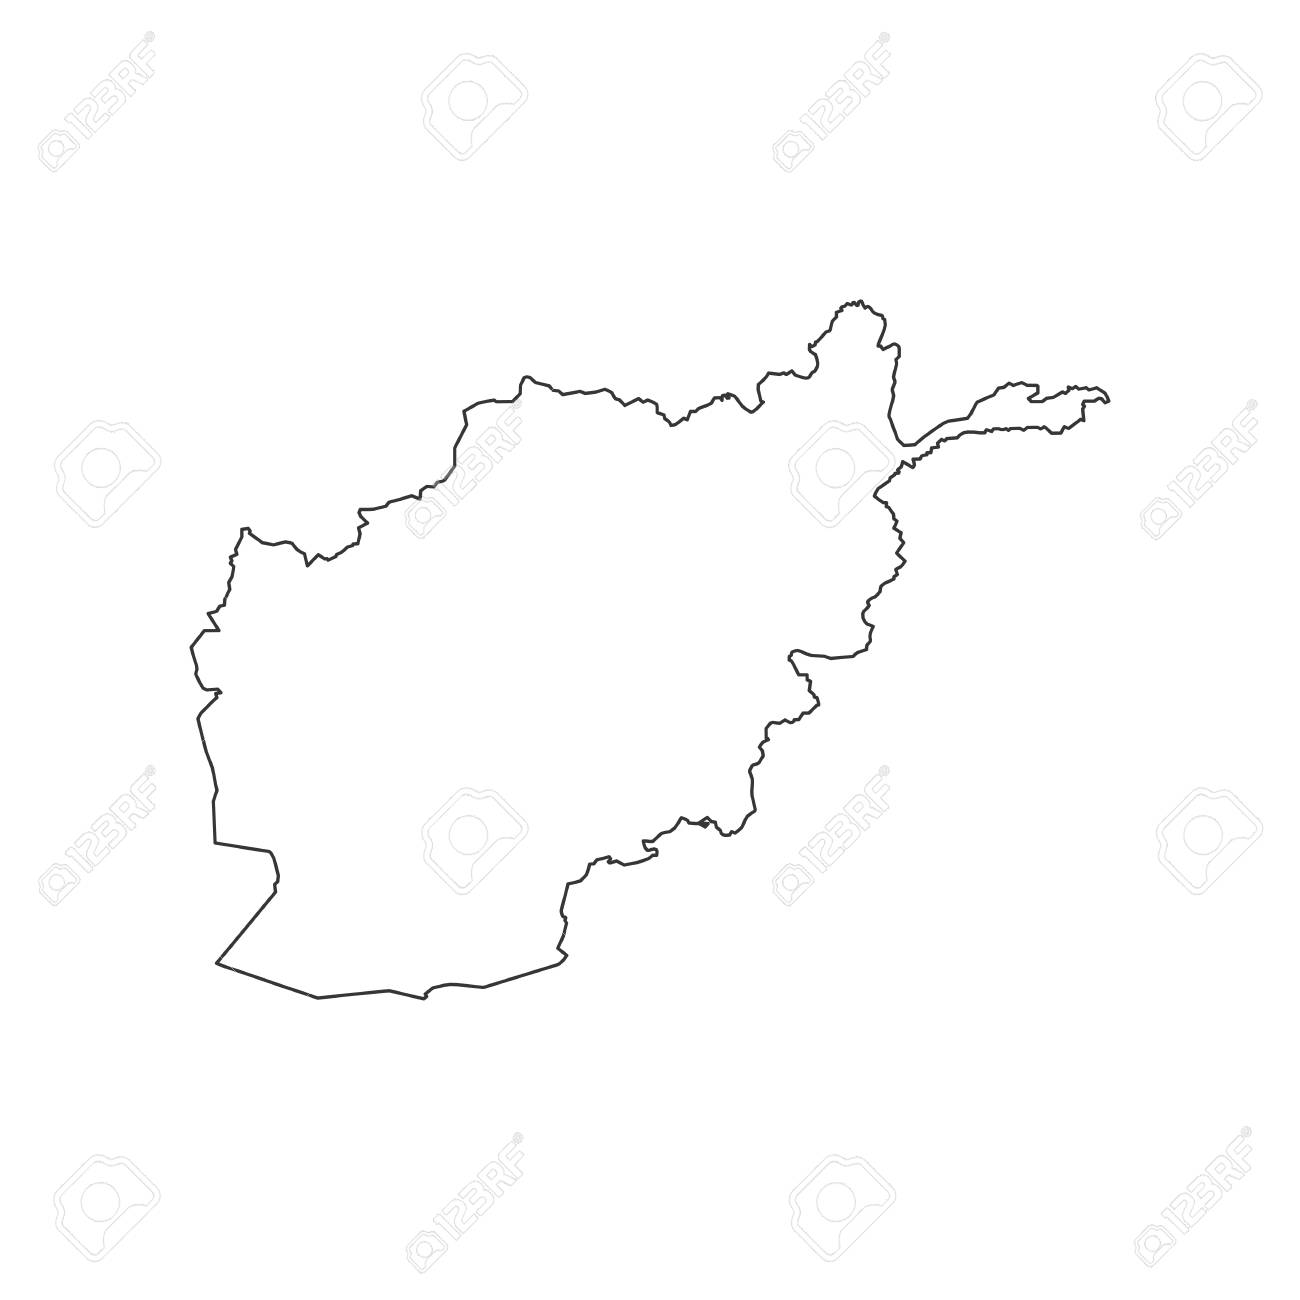 drawing of nicaragua, drawing of guatemala, drawing of colombia, drawing of tradition, drawing of arms race, drawing of indonesia, drawing of liberia, drawing of somalia, drawing of grenada, drawing of western hemisphere, drawing of senegal, drawing of ecuador, drawing of bahamas, drawing of honduras, drawing of greenland, drawing of deccan plateau, drawing of bulgaria, drawing of marshall islands, drawing of martinique, drawing of belgium, on drawing map of afghanistan